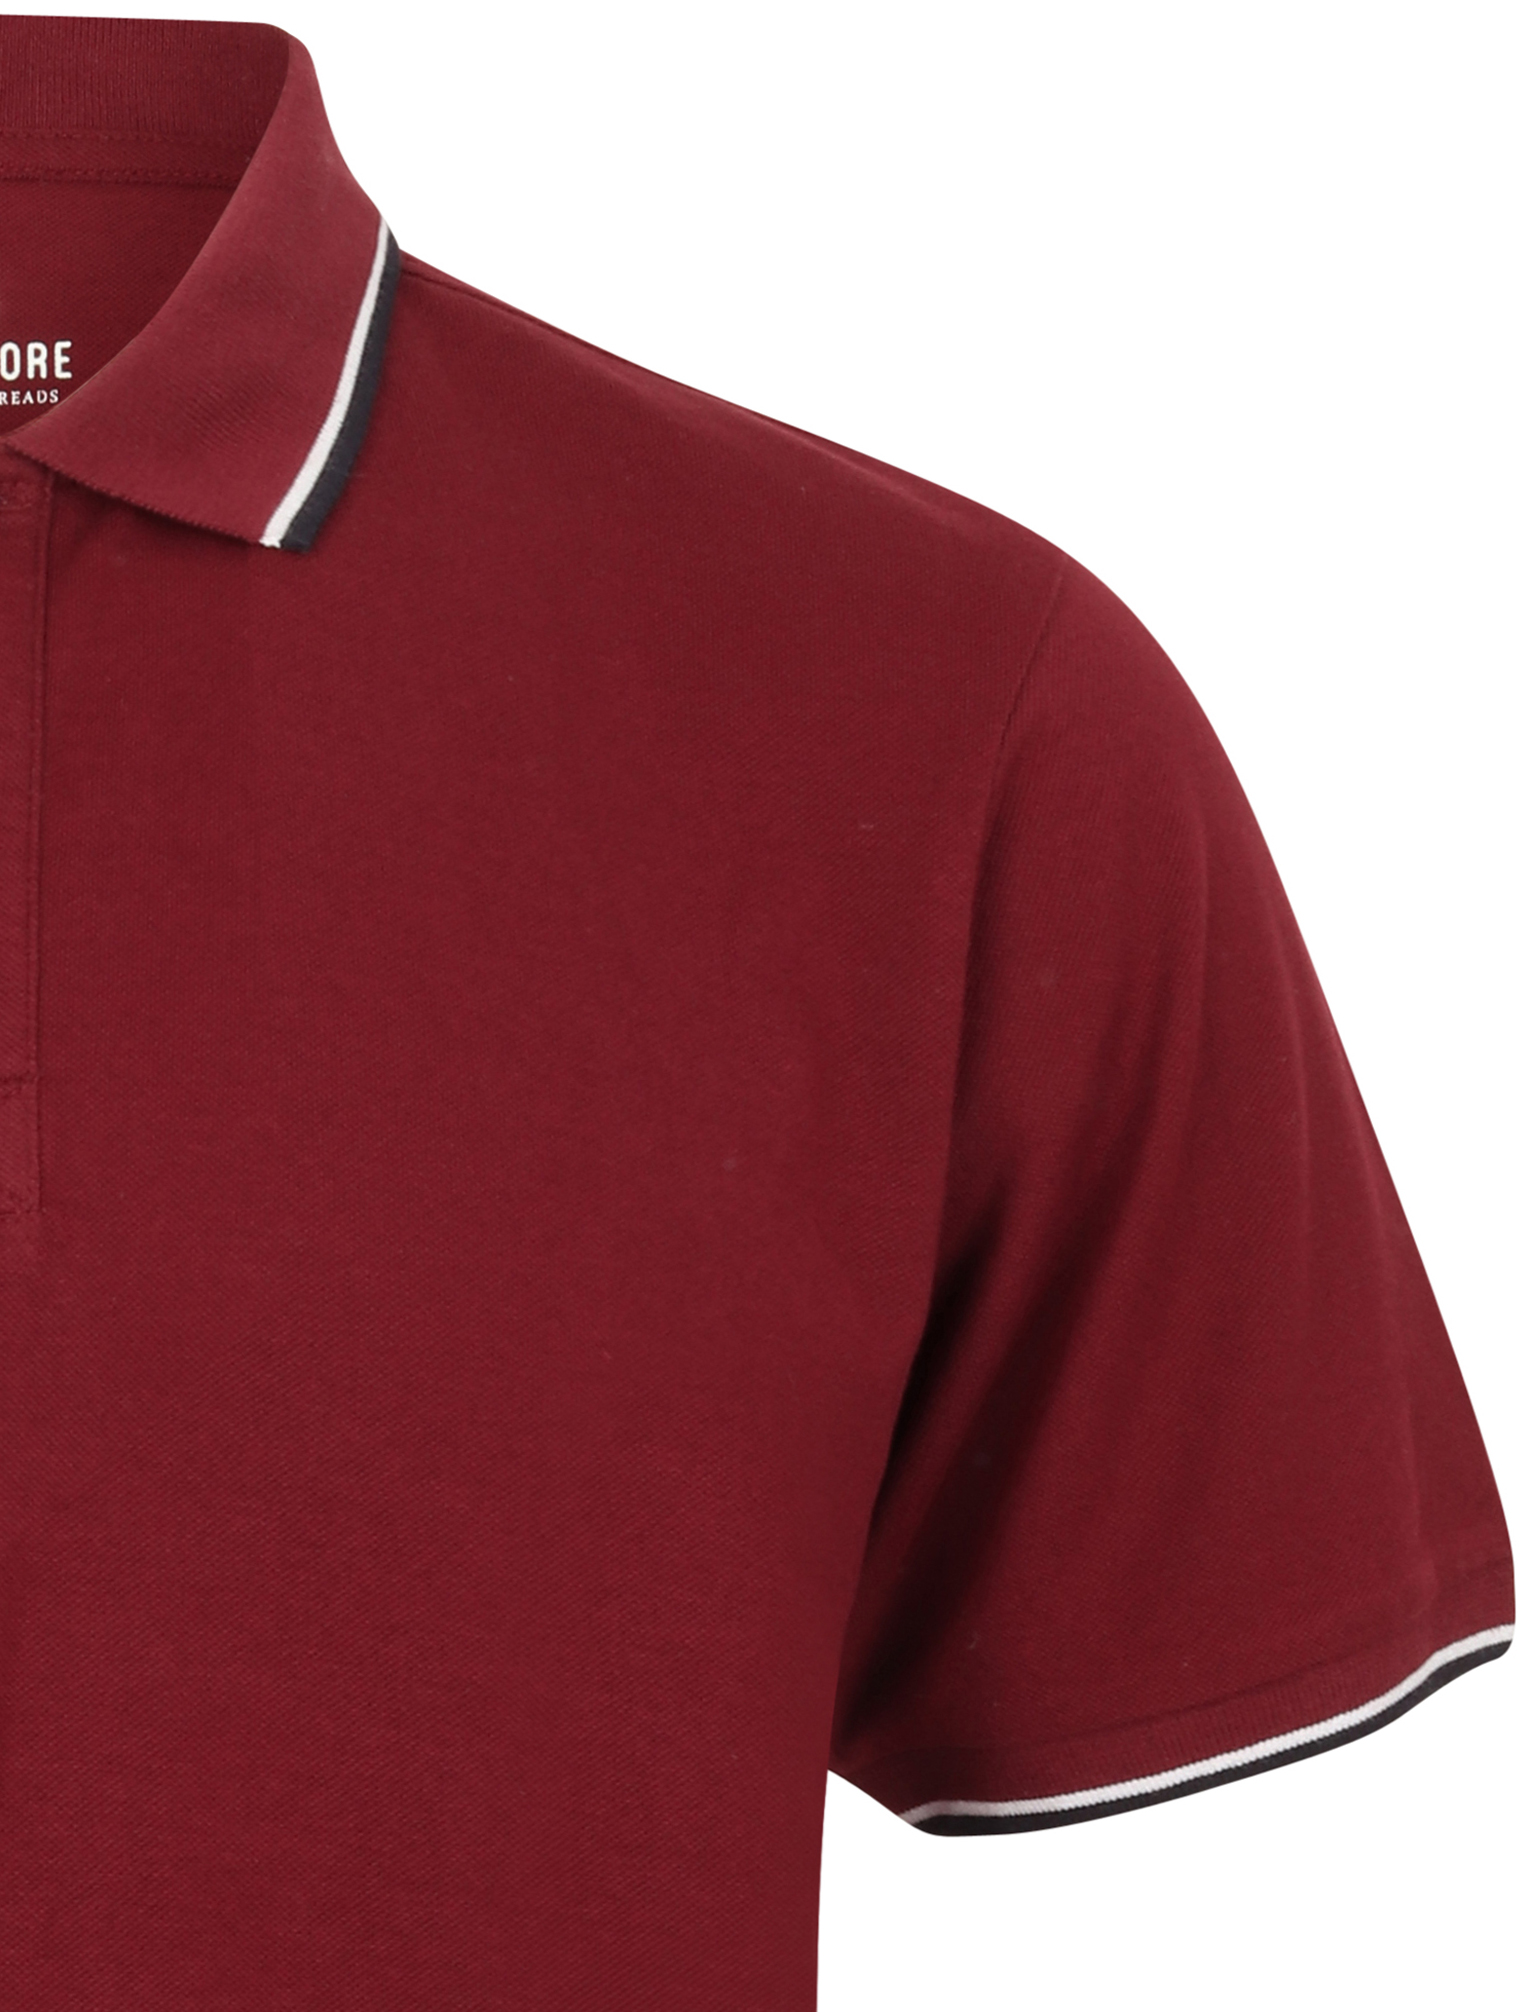 Sth-Shore-Mens-Plain-Polo-Shirt-100-Pique-Cotton-T-Shirt-Top-Collar-Size-M-XXL thumbnail 25